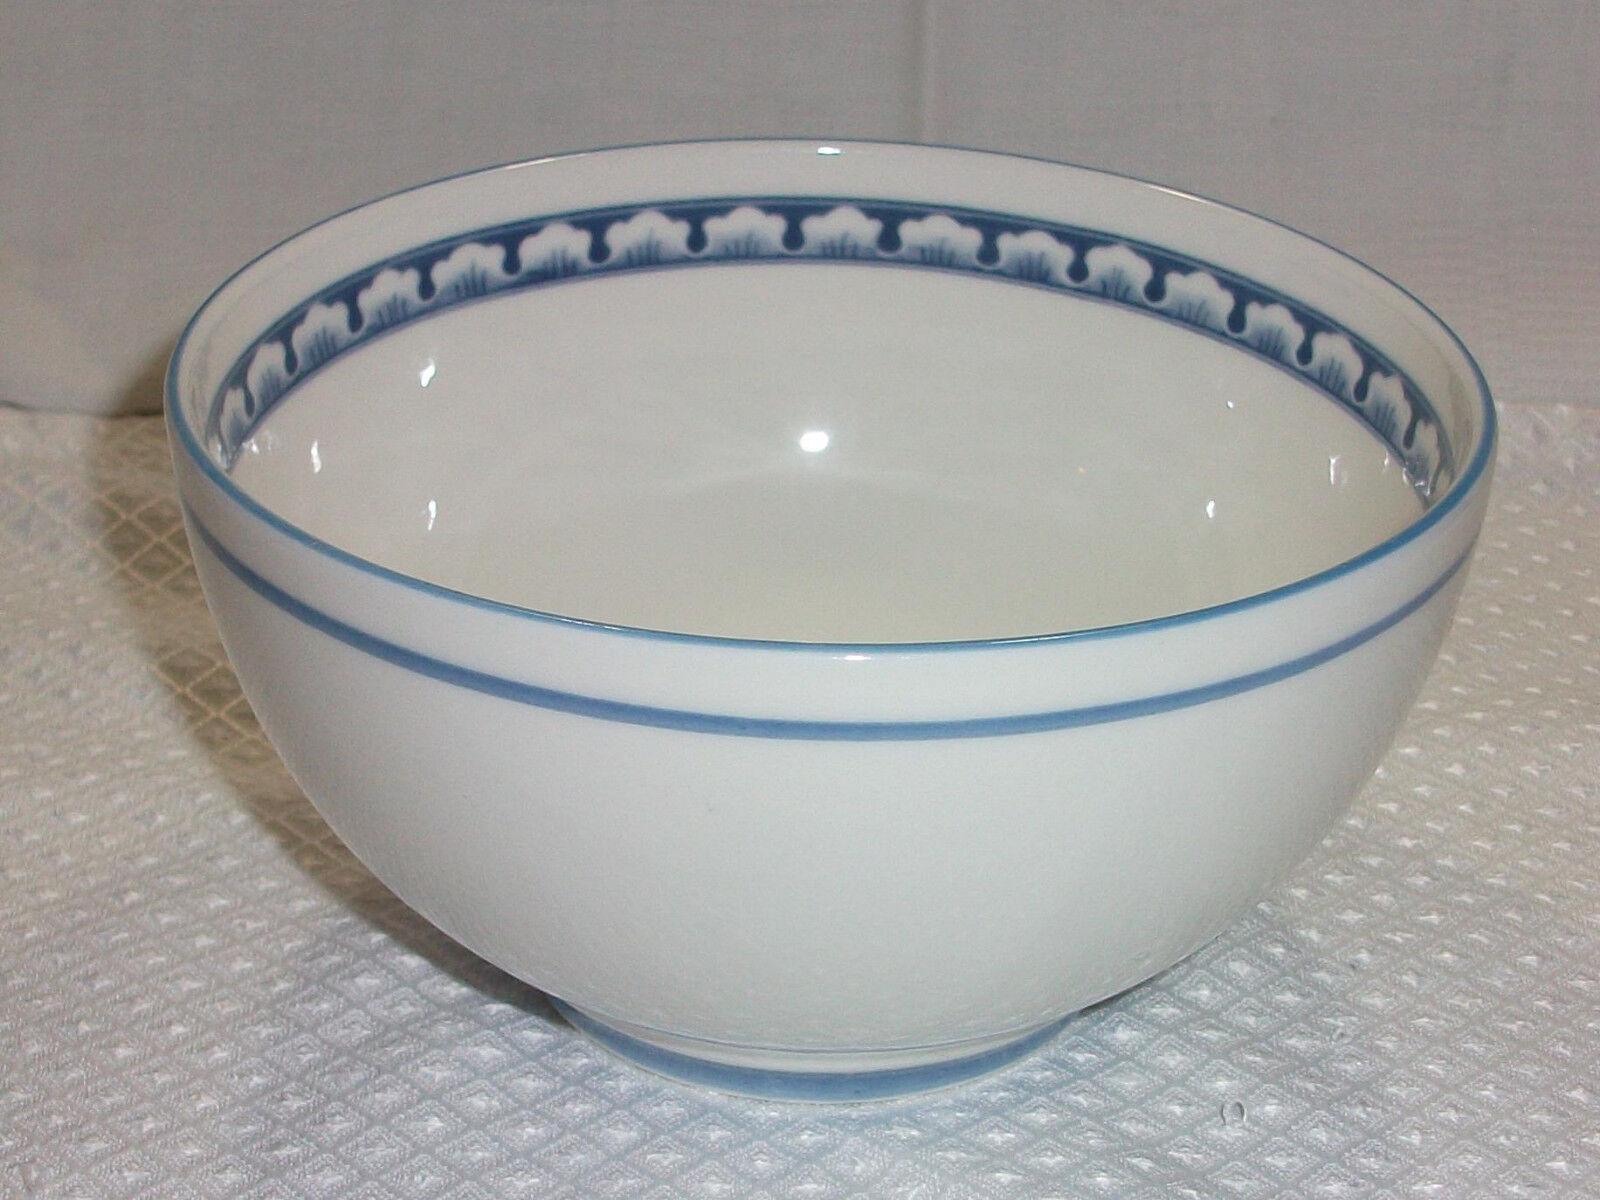 Villeroy & Boch - Casa Blau - Müsli-Schale Bowl - RAR | Stil